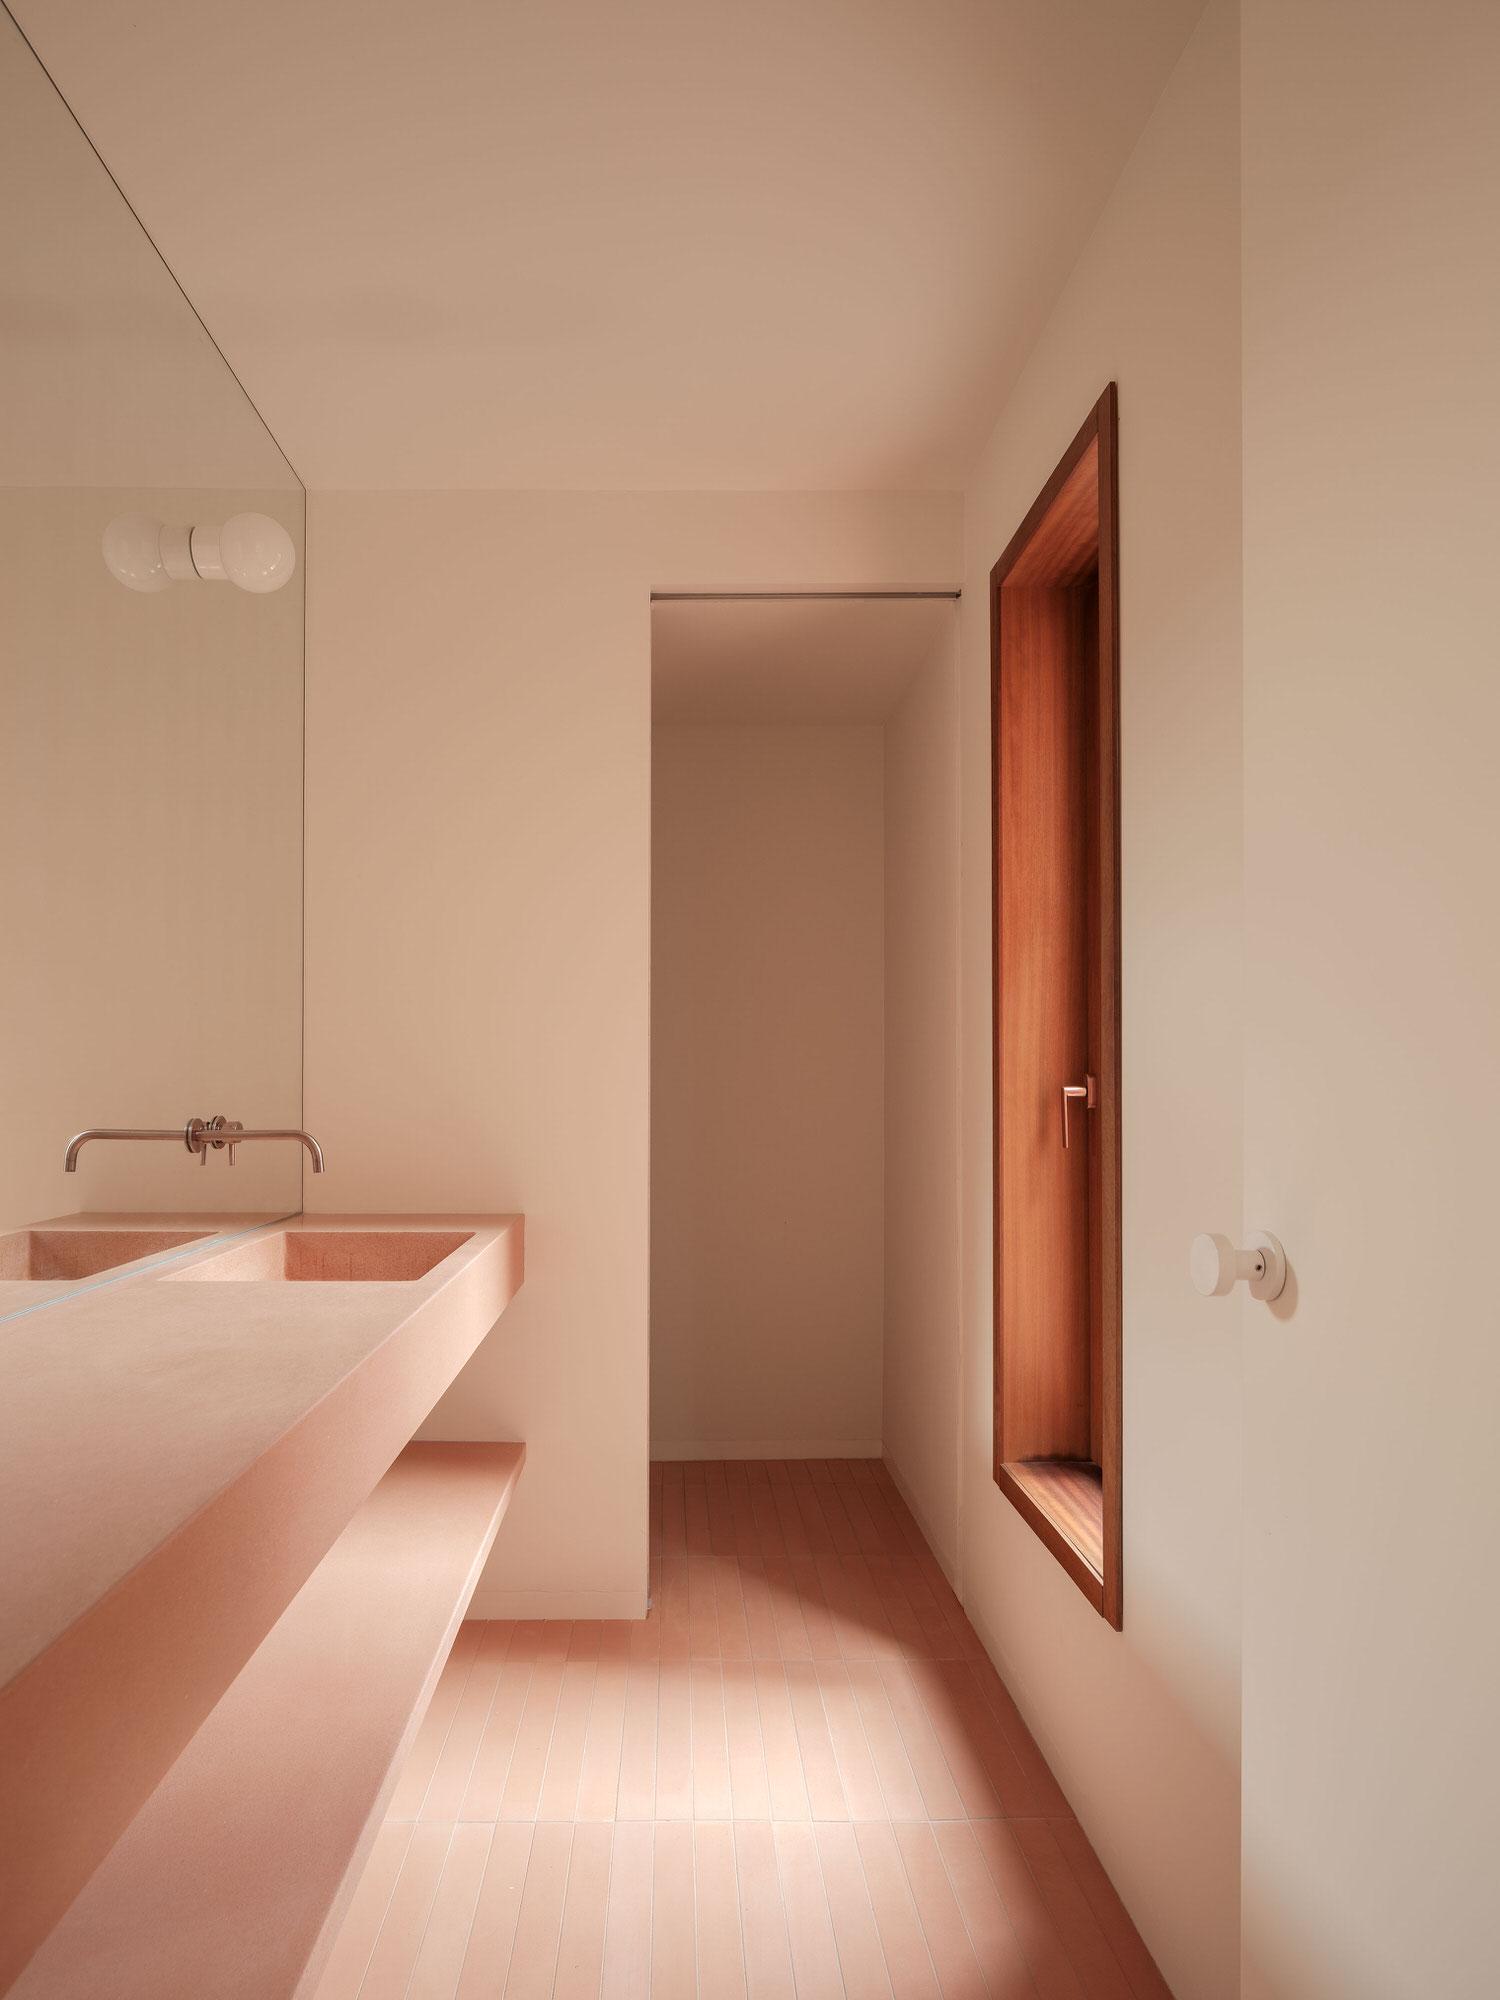 Santa Maria Lovers House Mallorca Isla Architects Photo Luis Diaz Diaz Yellowtrace 15